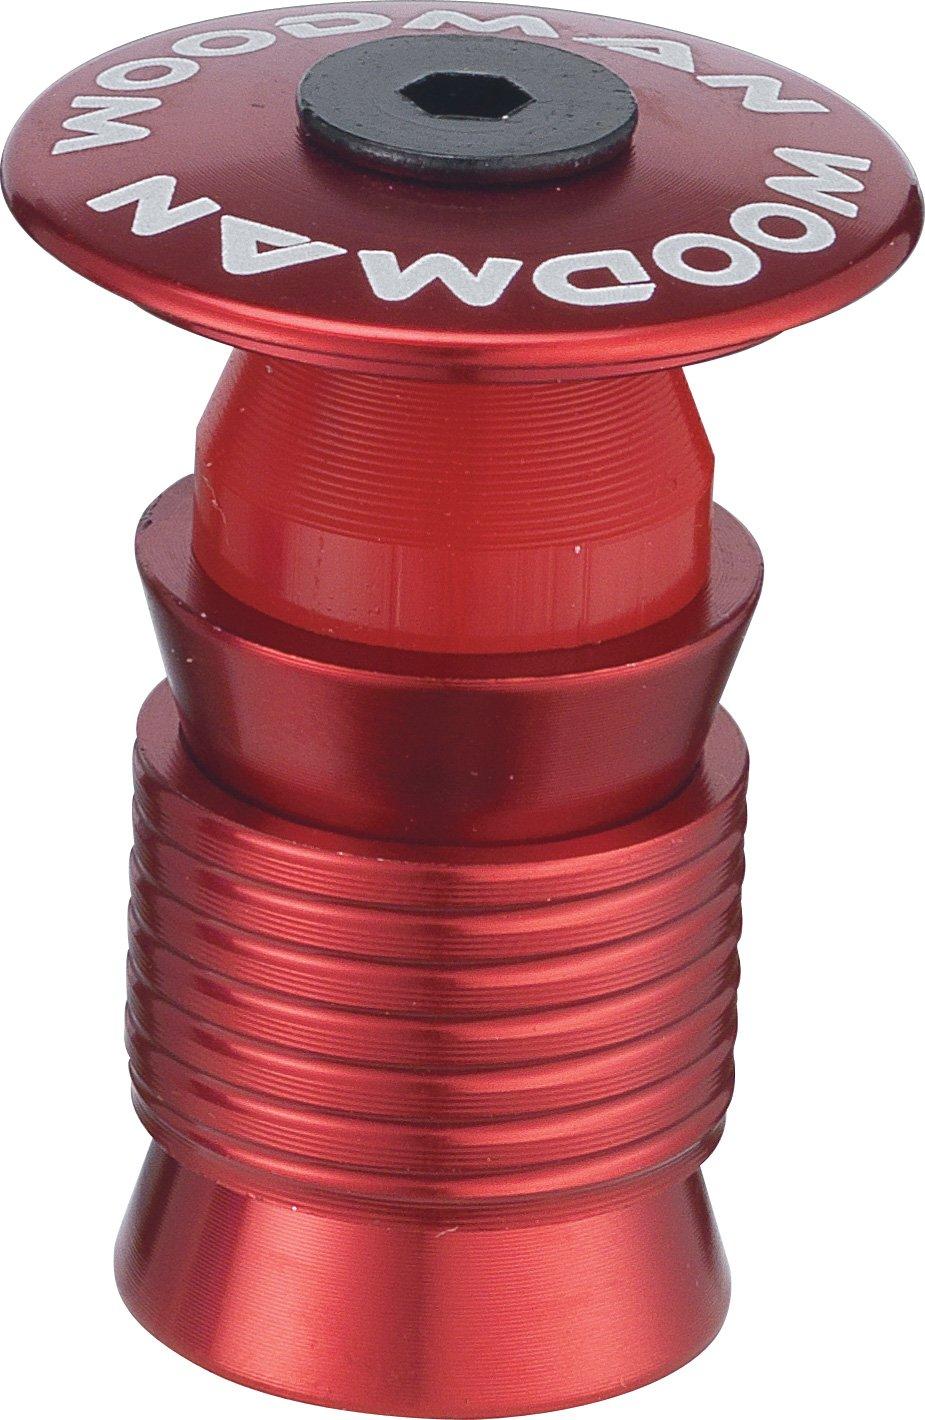 Woodman Capsule PH 1.1/8' Reuseable Ahead Plug: Aqua Red Alloy Top Cap